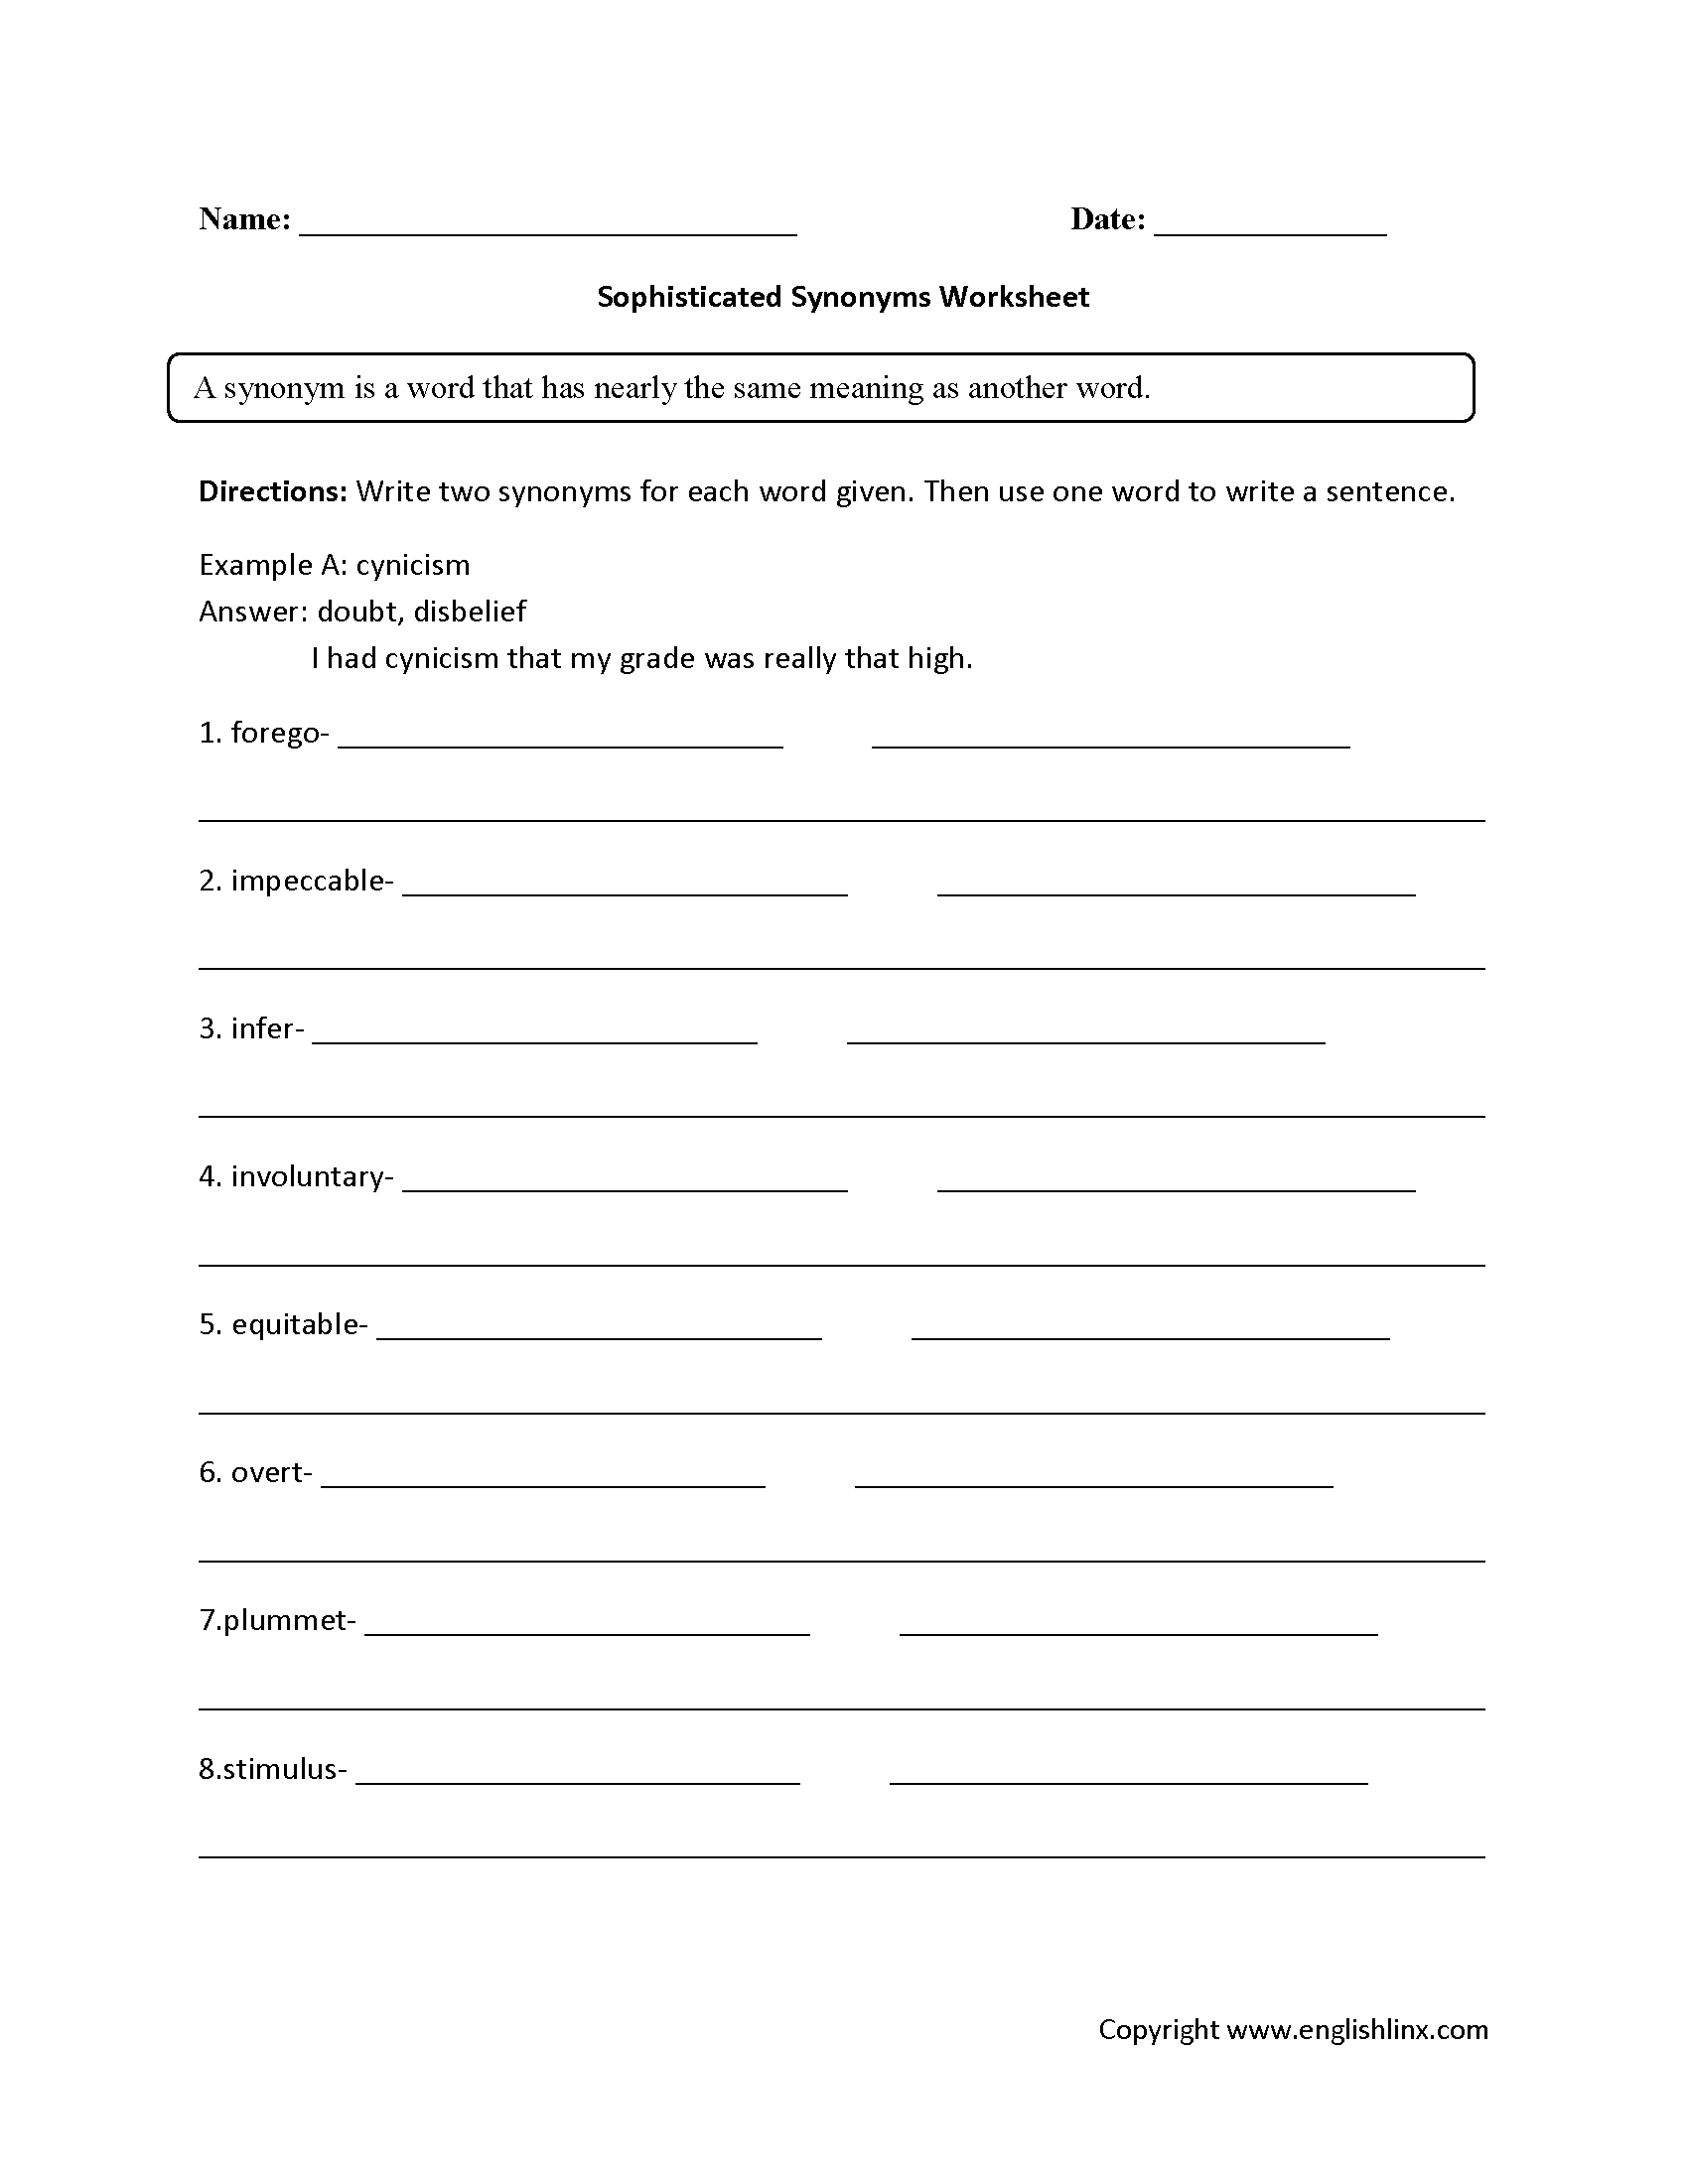 medium resolution of Sophisticated Synonyms Worksheets   Synonym worksheet